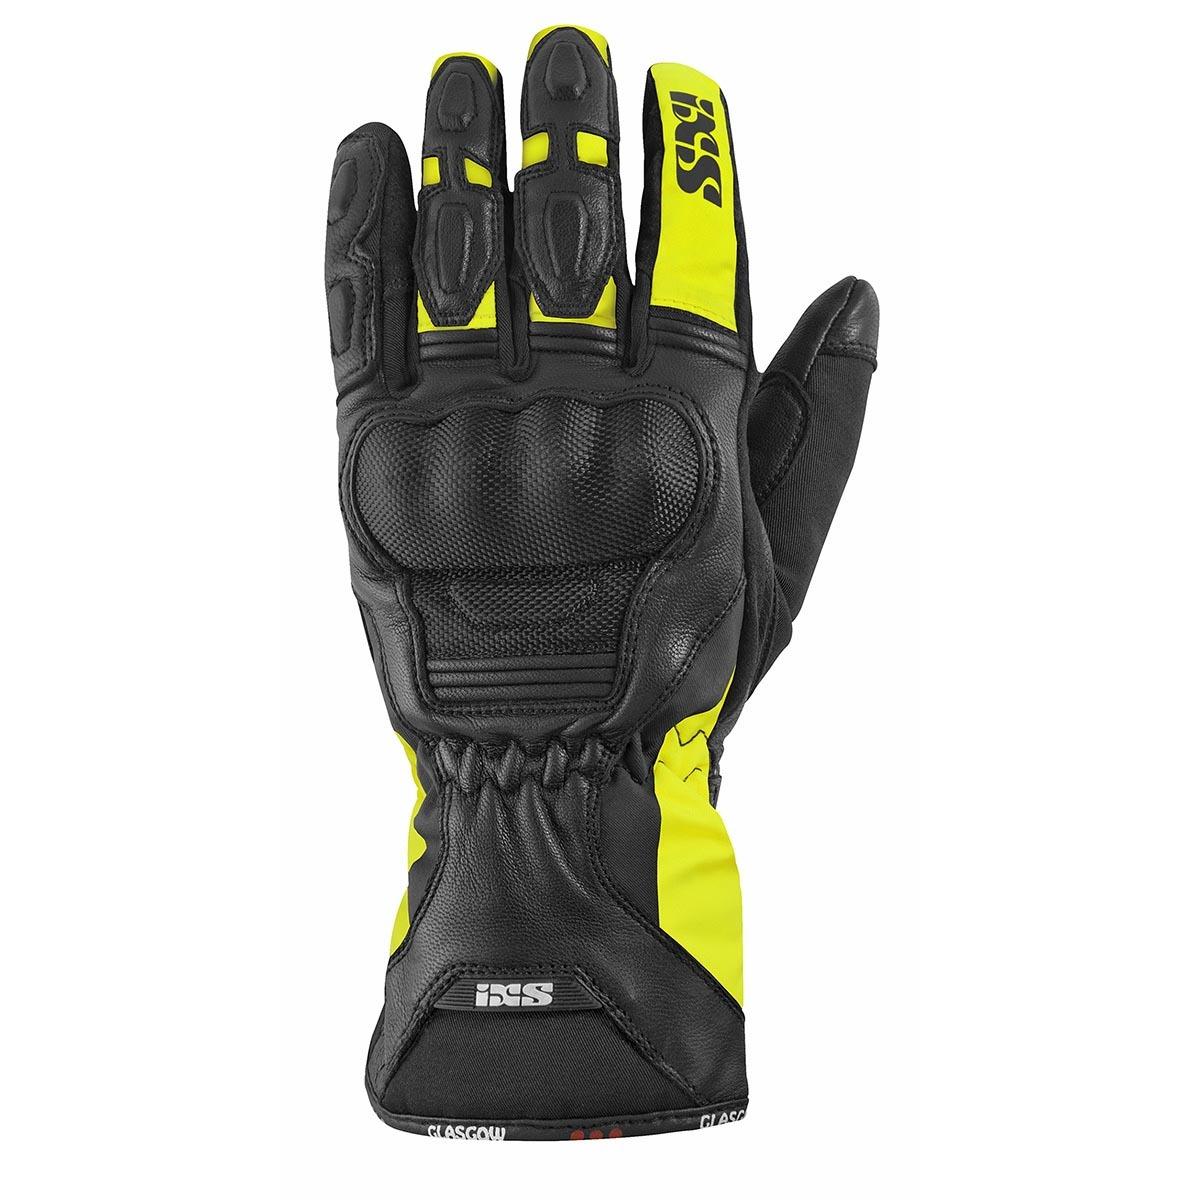 IXS GLASGOW MEN black/yellow